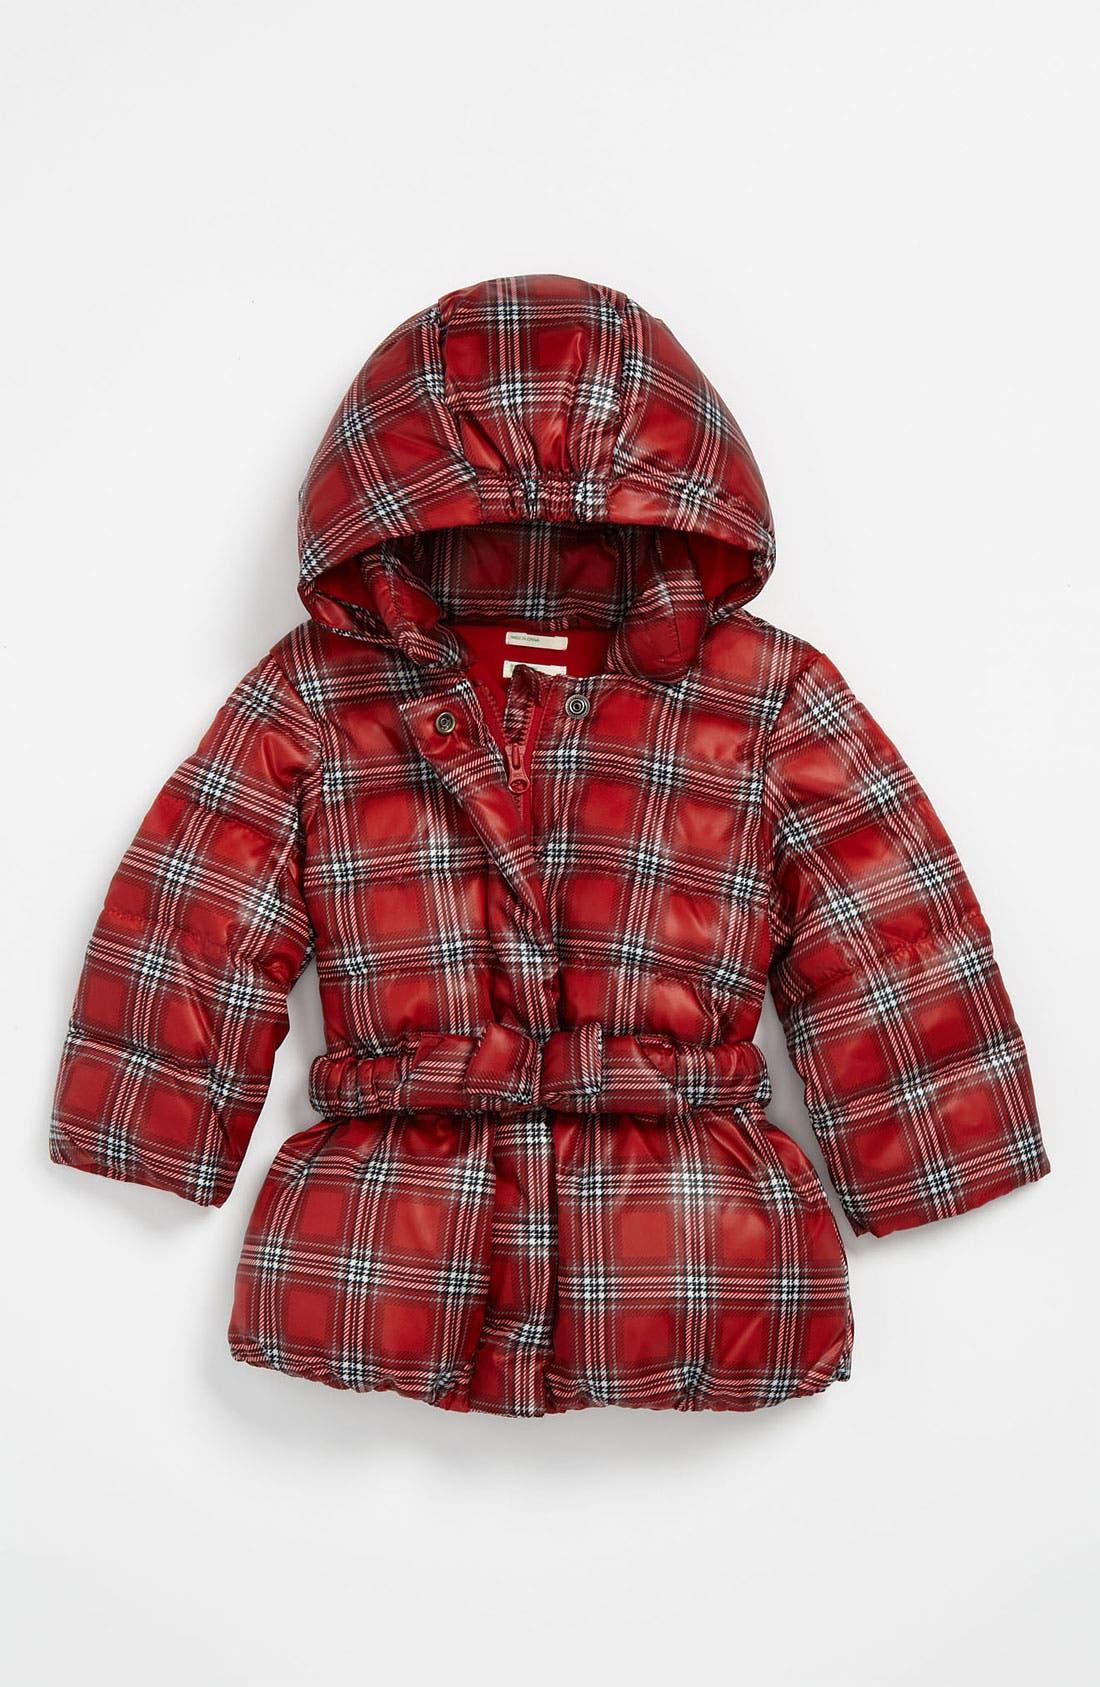 Main Image - United Colors of Benetton Kids Plaid Puffer Coat (Infant)